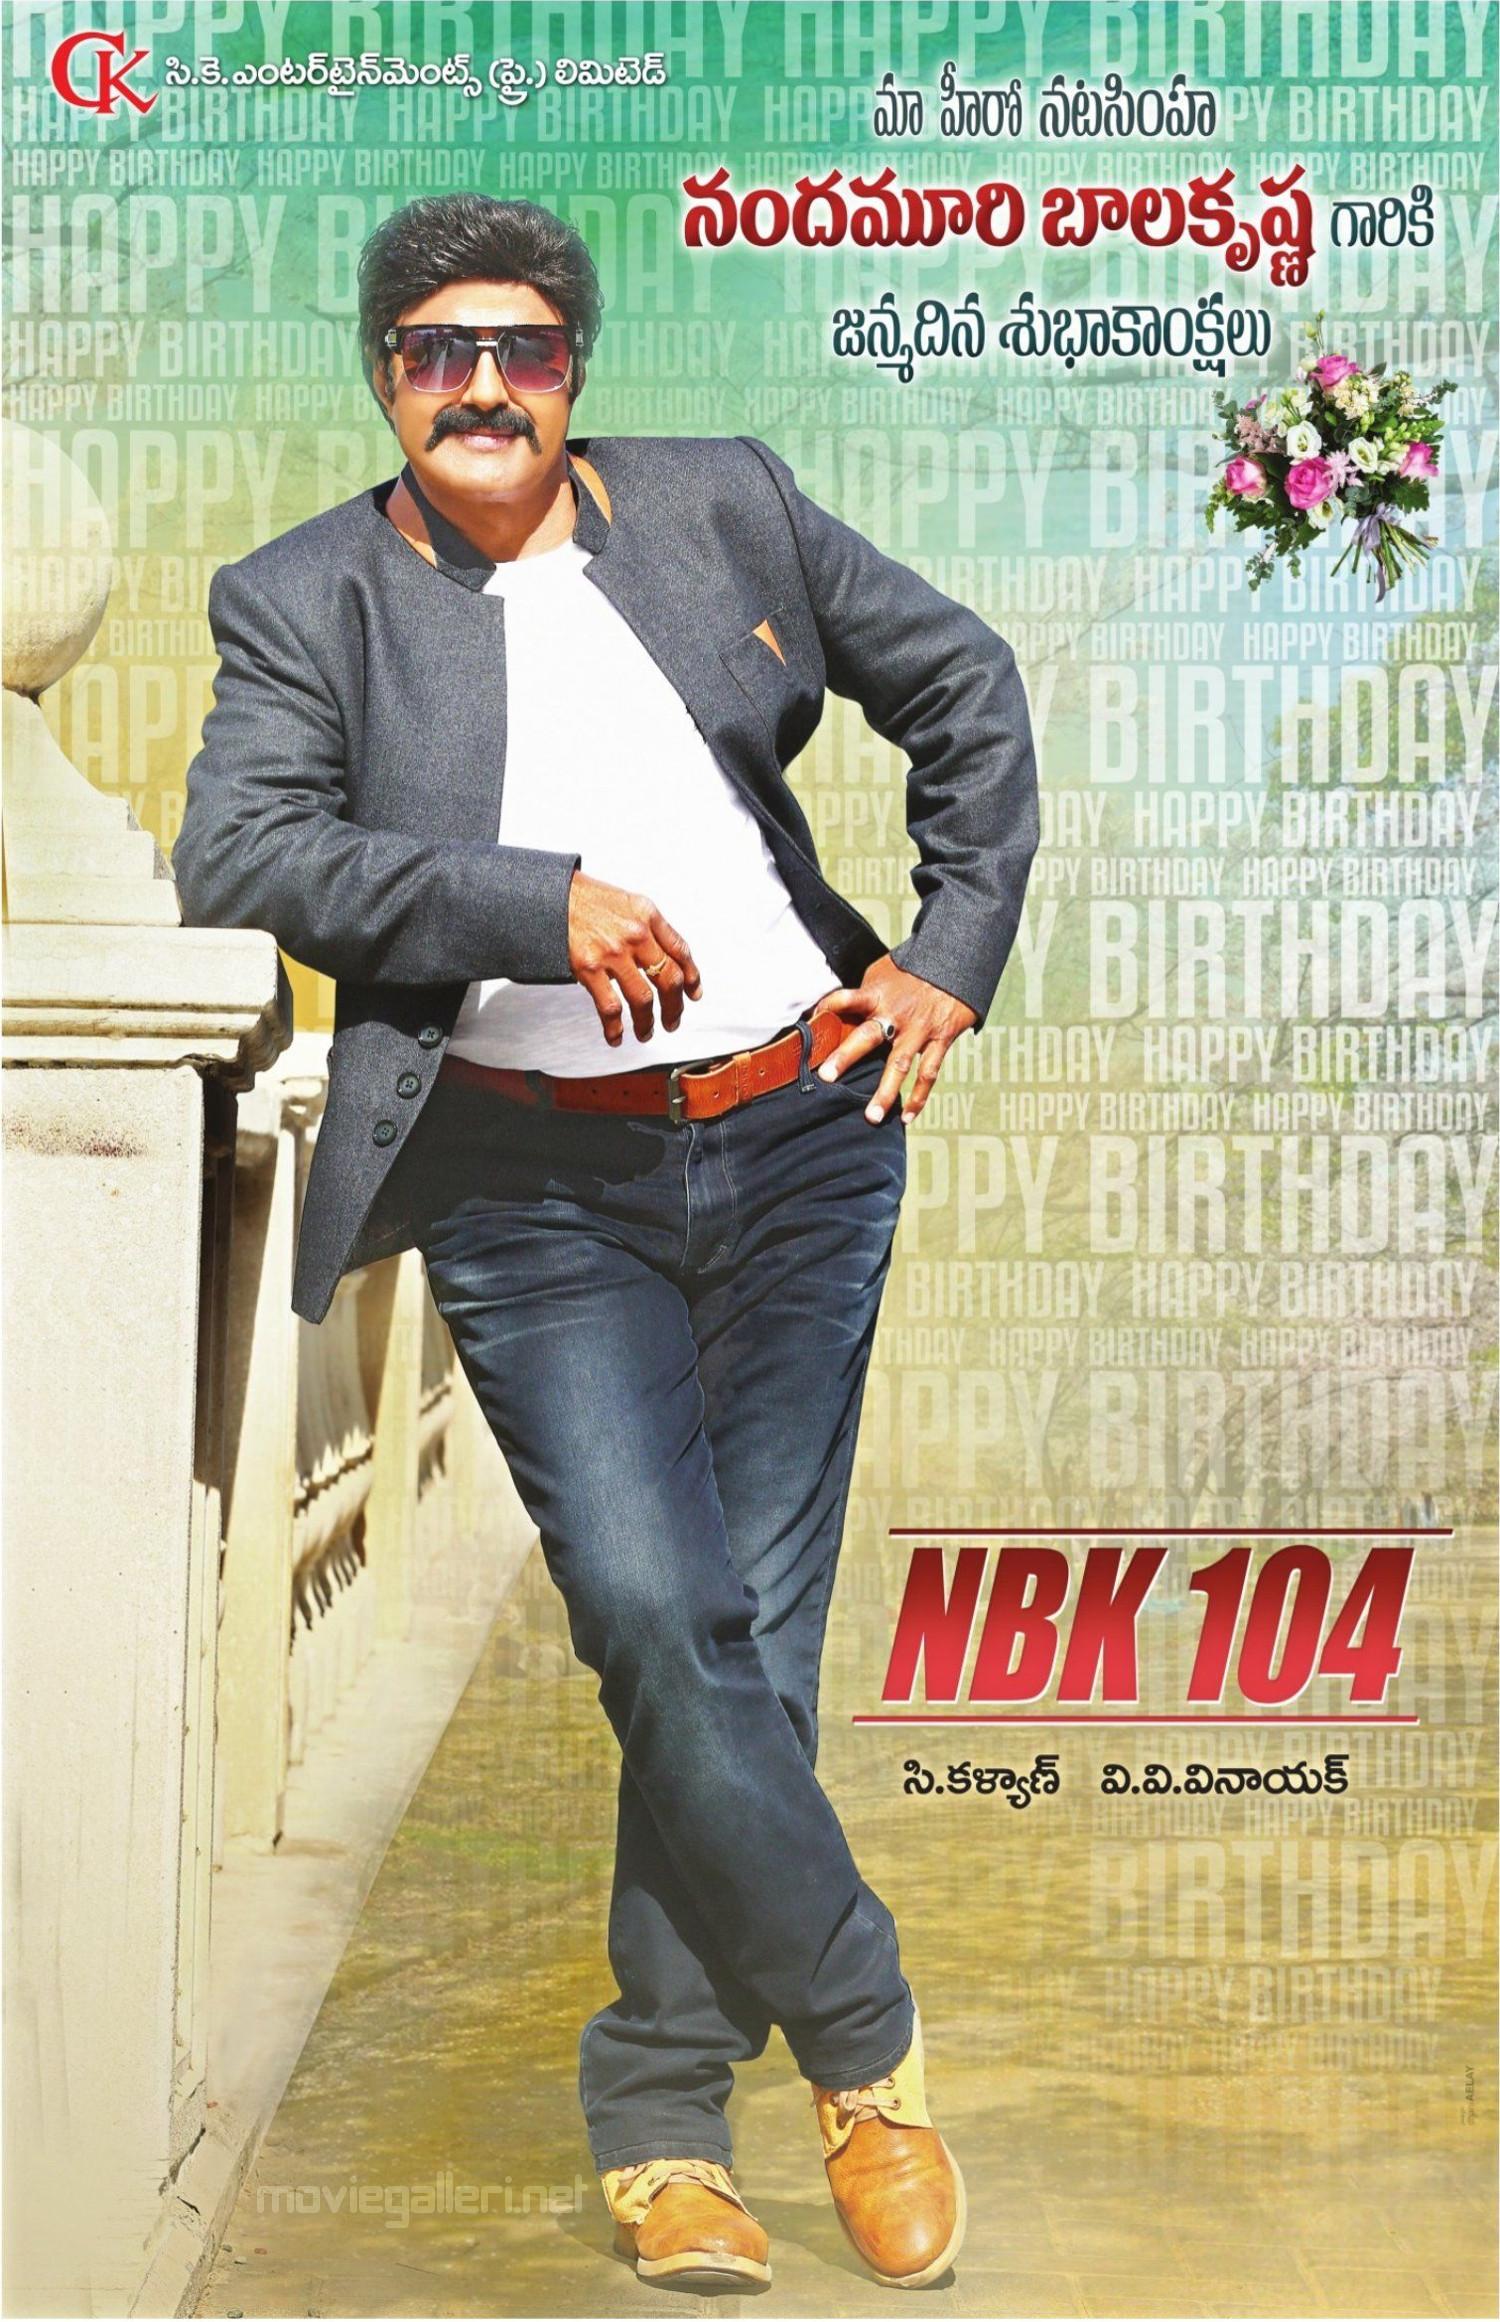 Nandamuri Balakrishna Birthday Poster from NBK 104 Movie Team